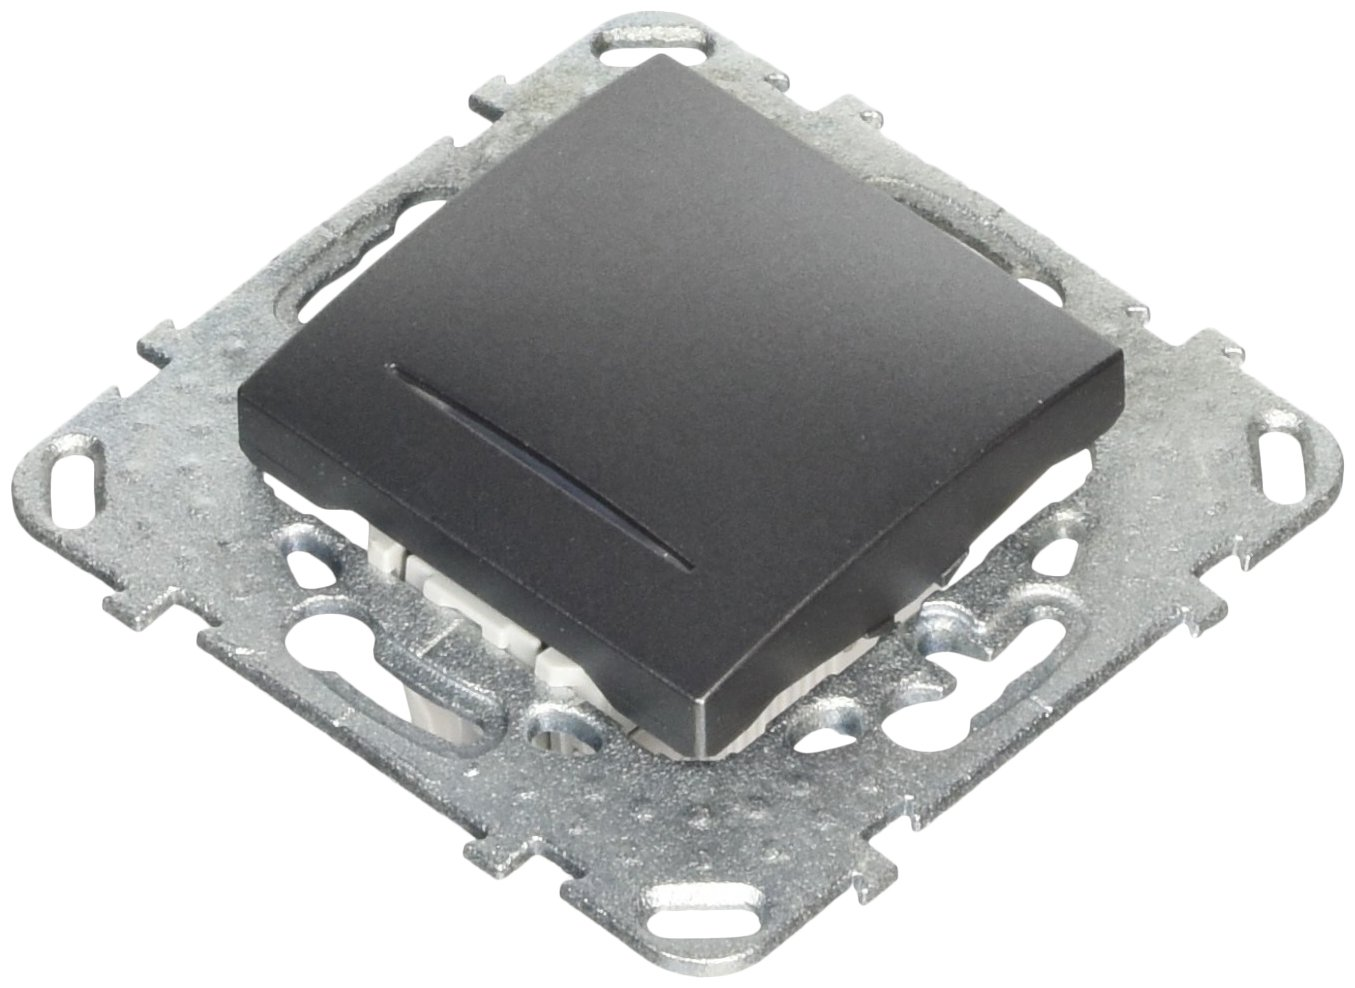 Schneider electric SC5MGU520330NZF Unicatop cambiar con indicador luminoso /& amp; aluminio trata de la instalaci/ón